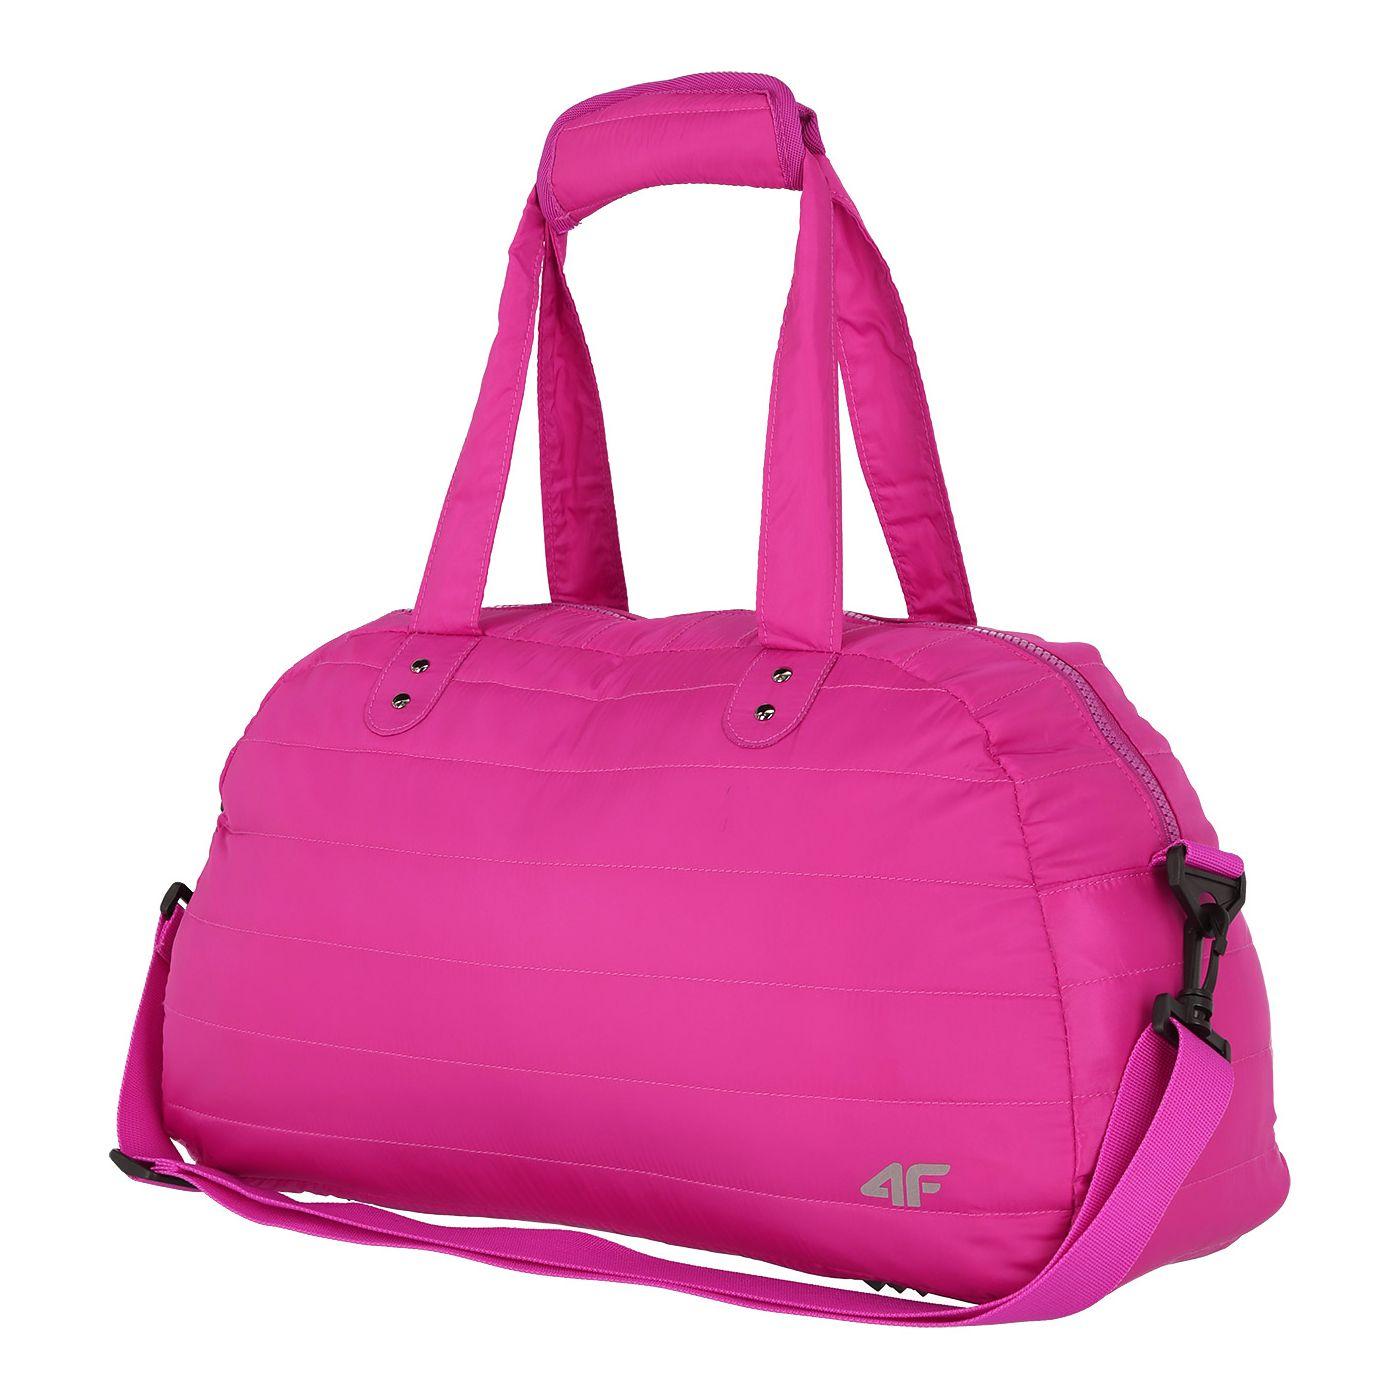 Travel bag 4F TPU004